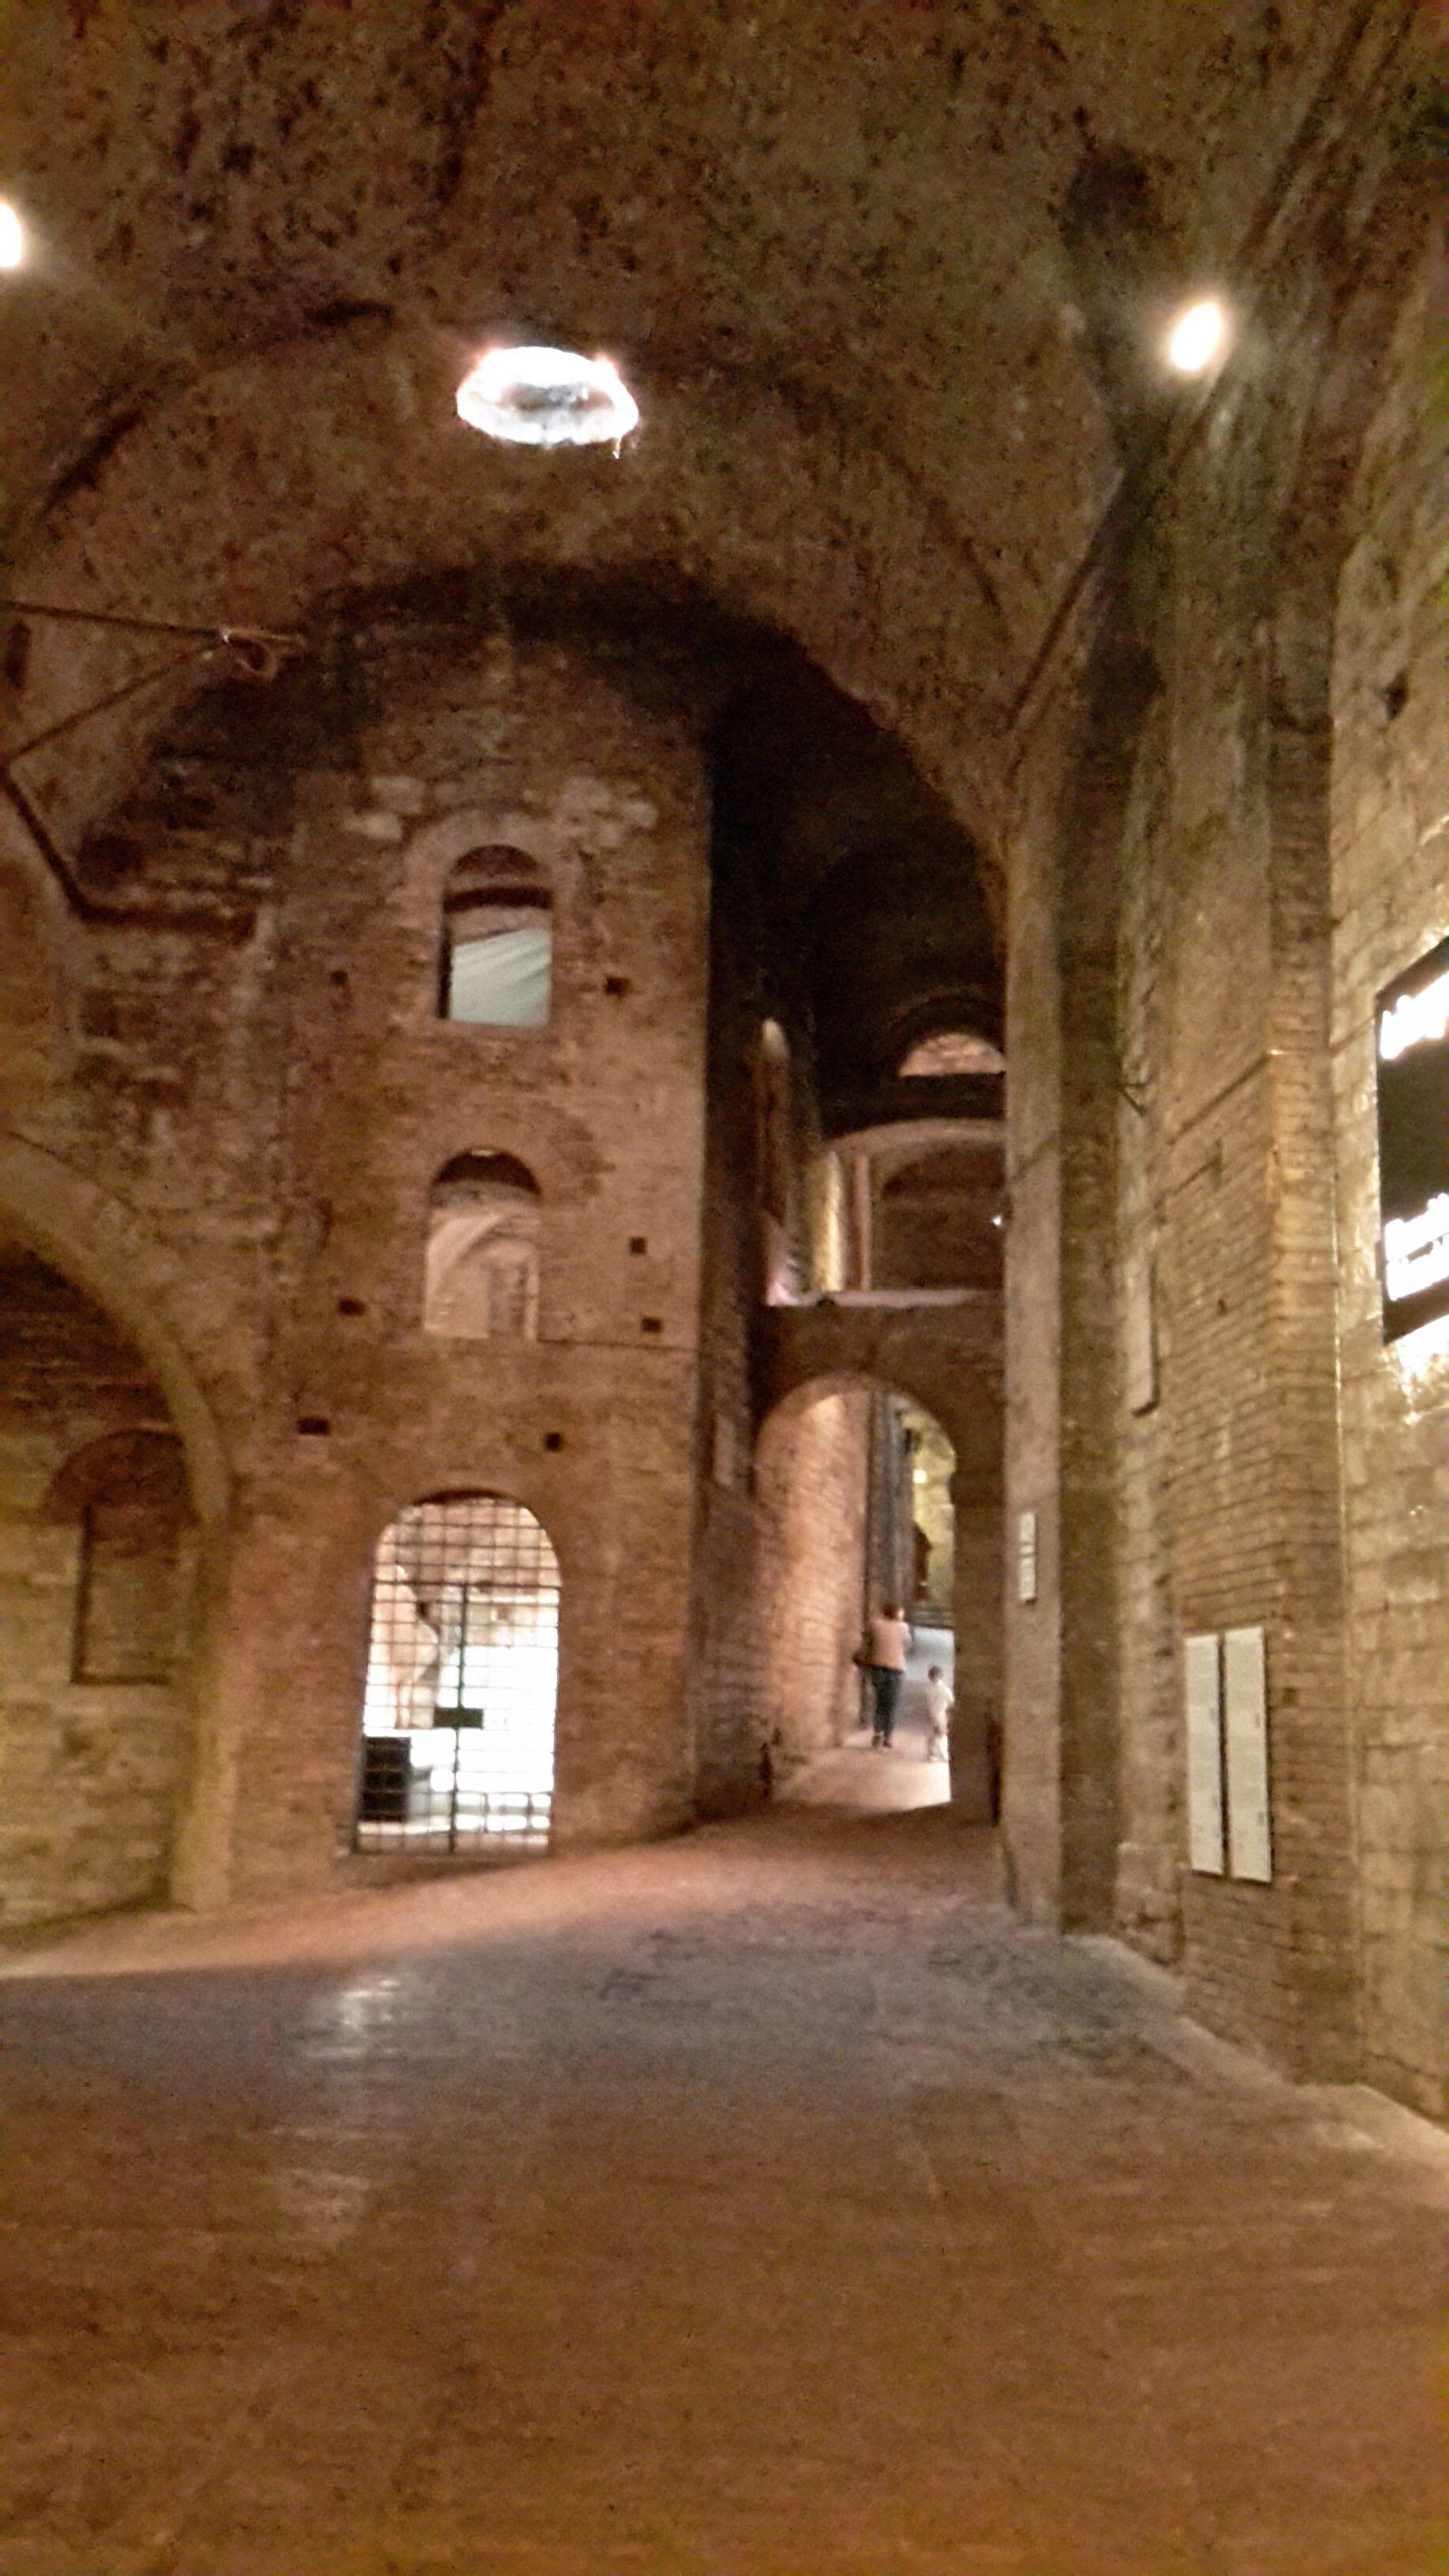 Rocca Paolina Perugia Umbria, Perugia, Dell anima